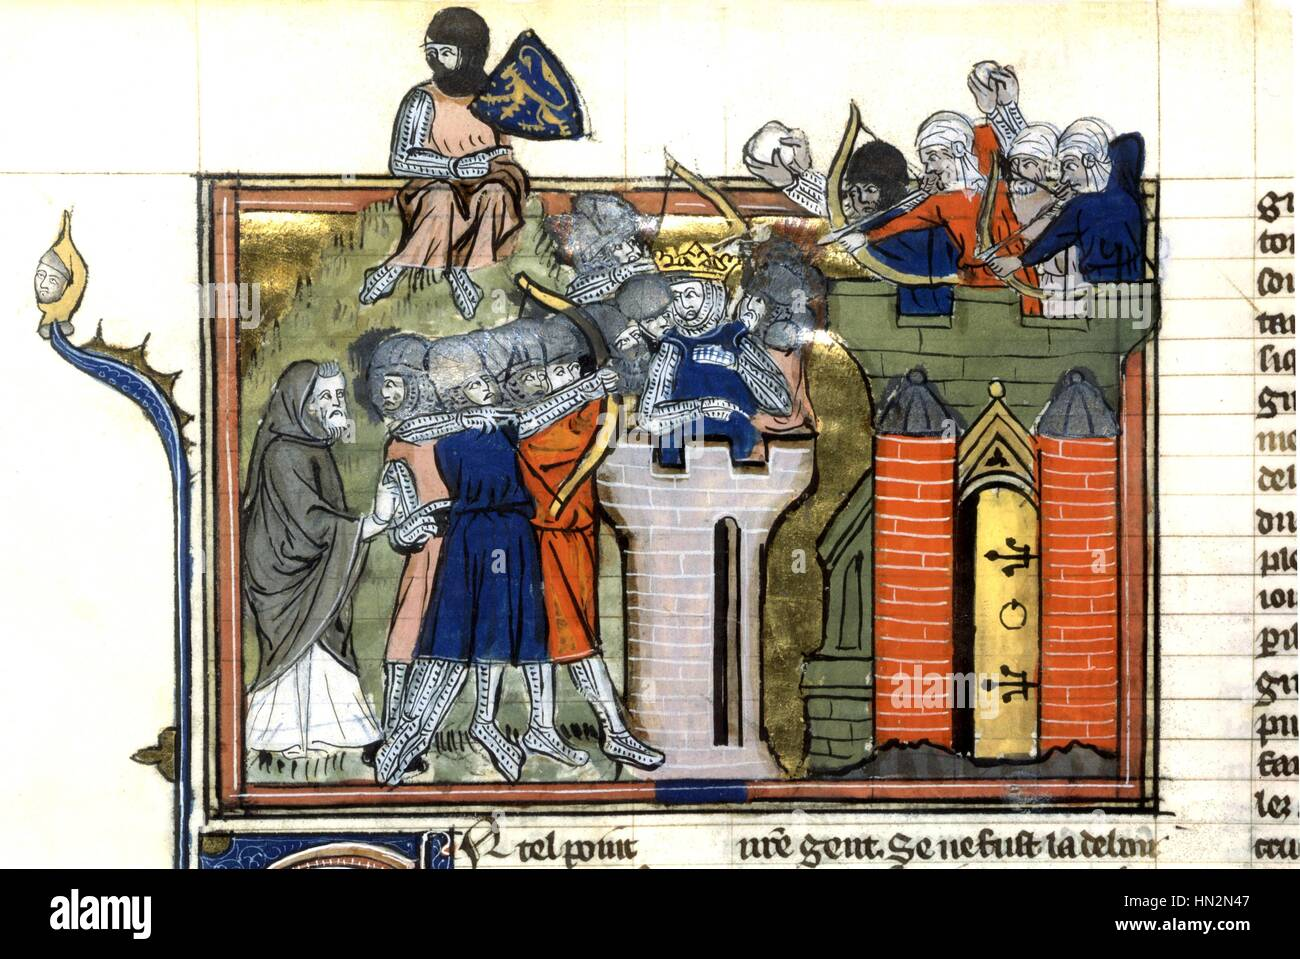 1st Crusade (1096-1099). The Romance of Godefroy de Bouillon Capture of Jerusalem Manuscript 14th century - Stock Image